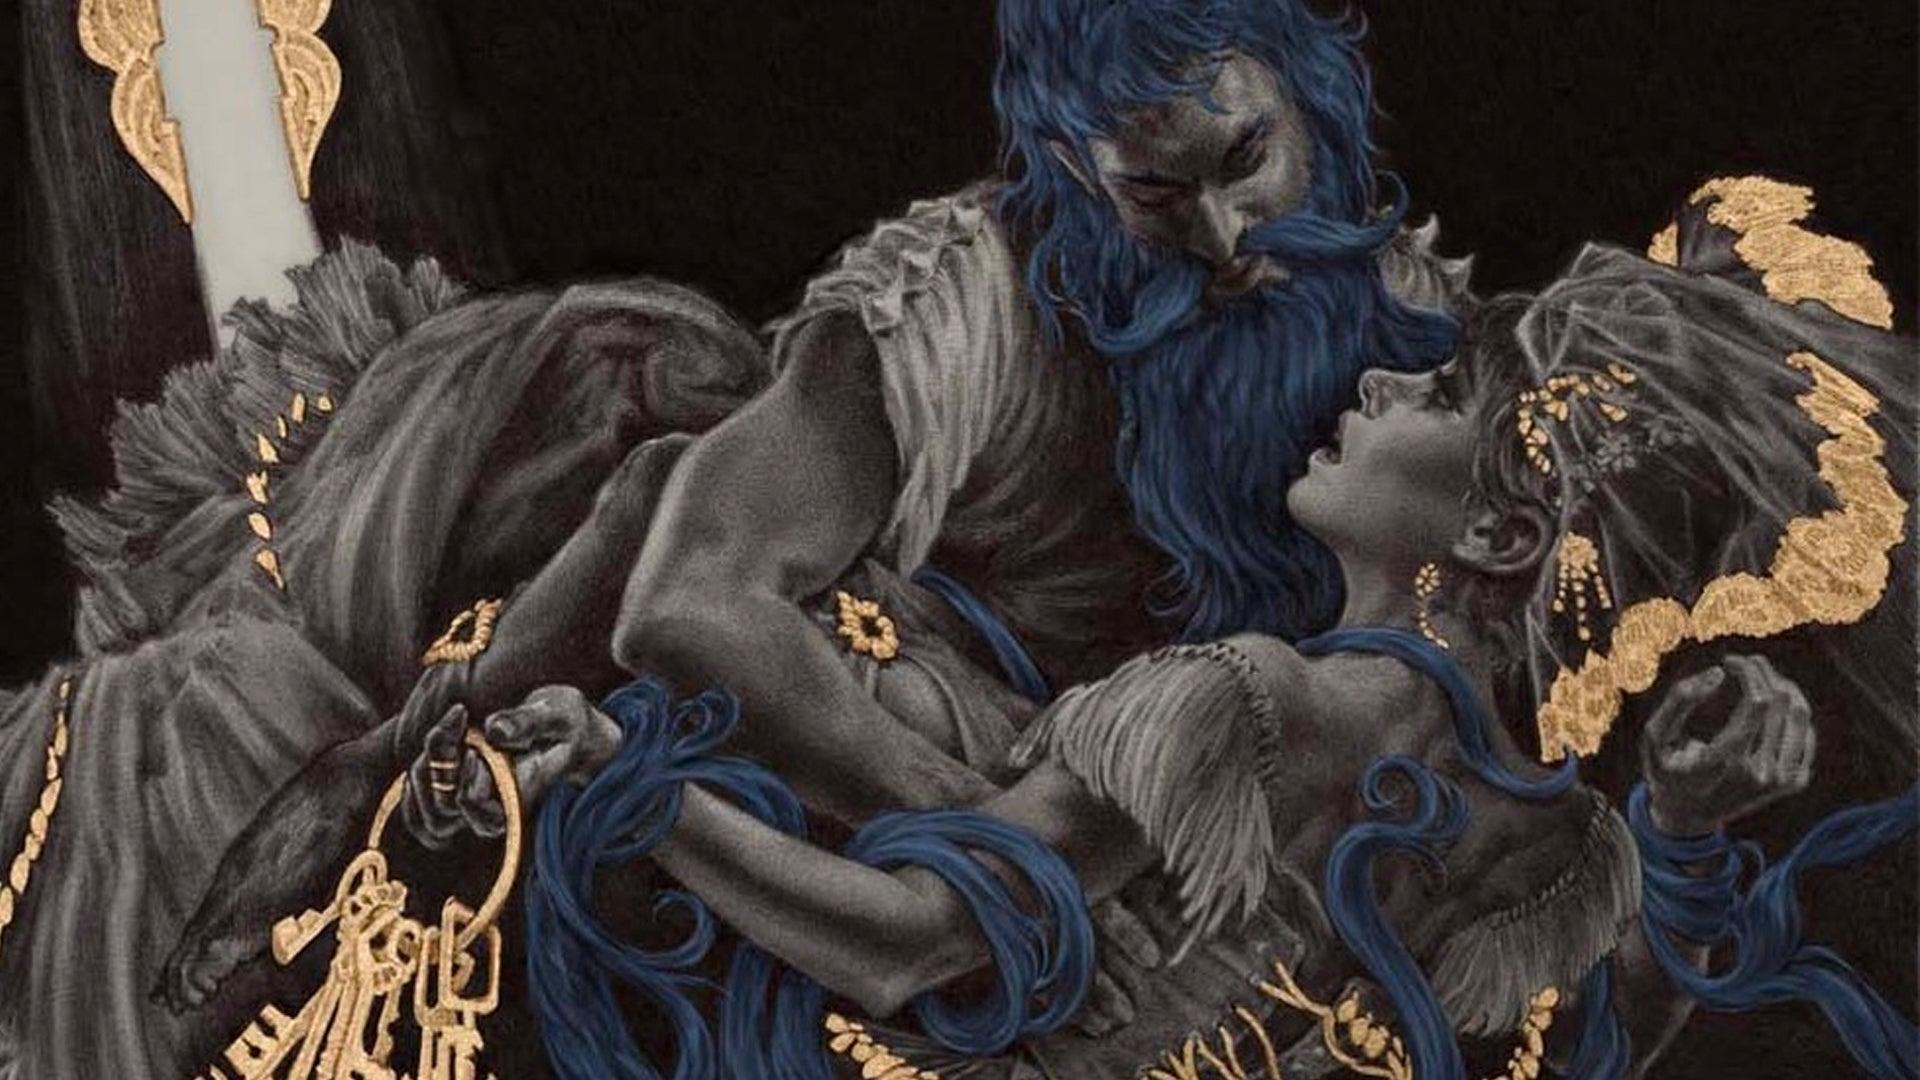 bluebeards-bride-rpg-artwork.jpg